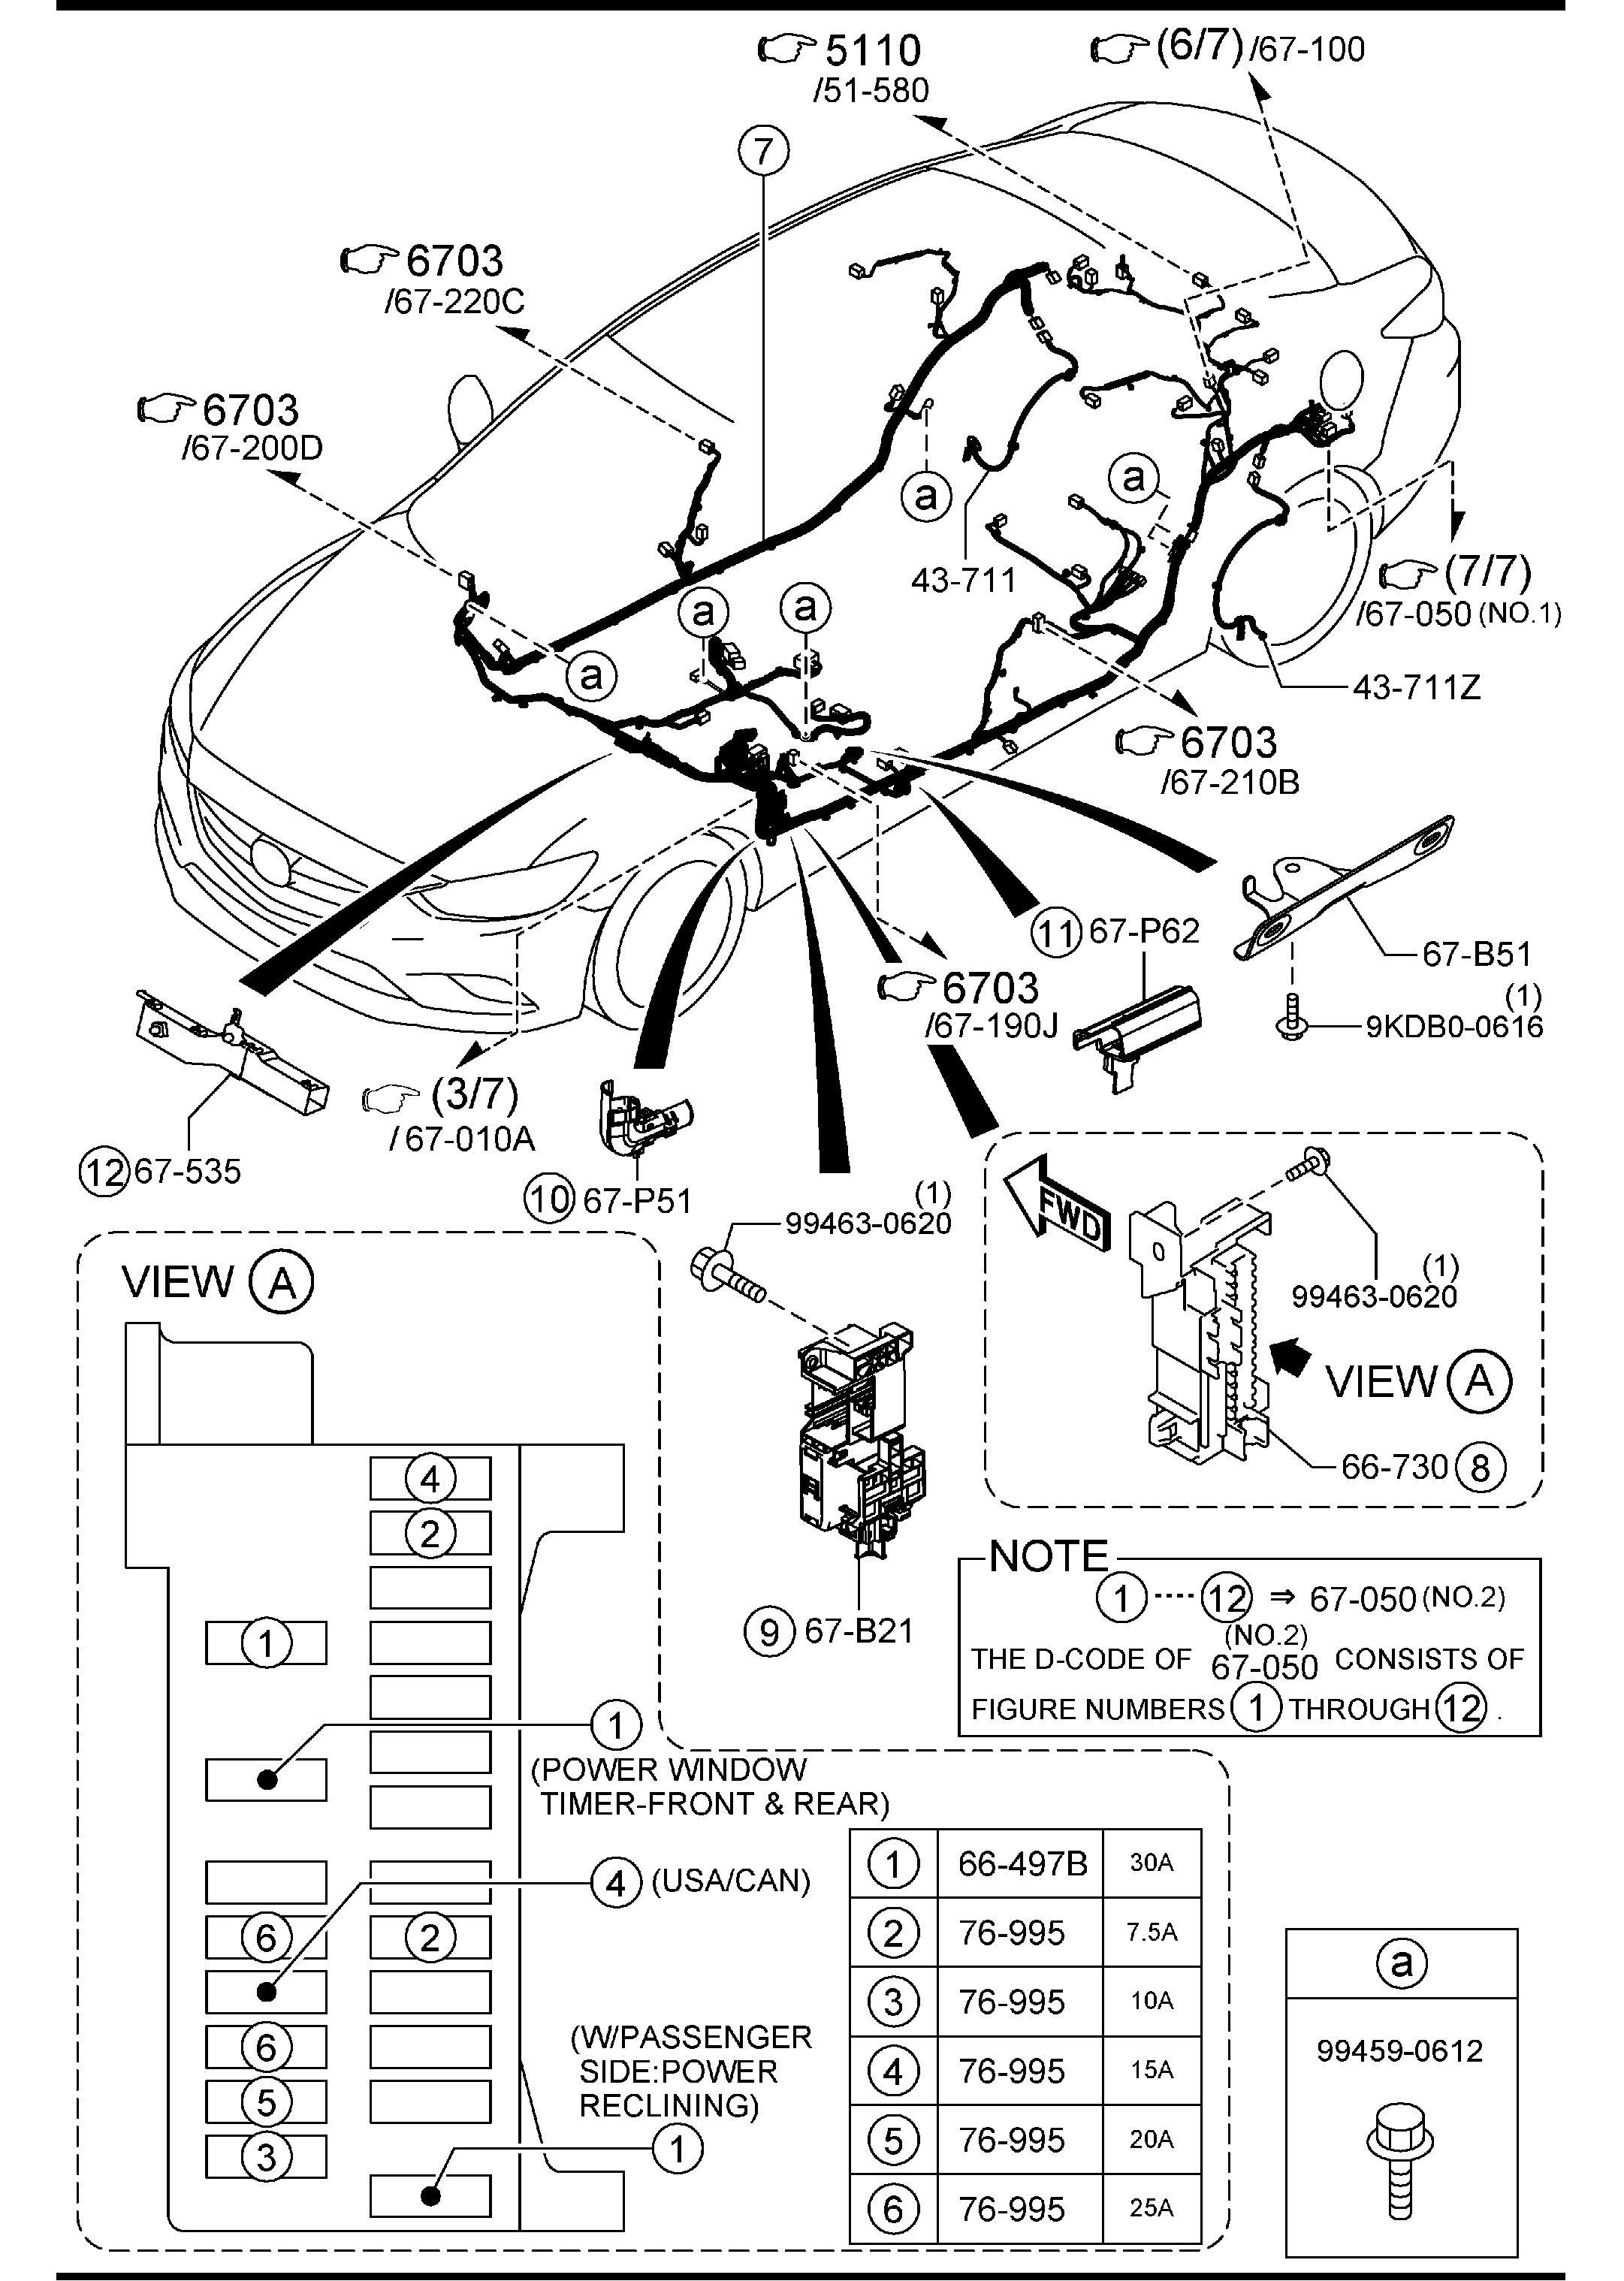 Mazda Rx Vacuum Diagram Auto Wiring. Mazda. Auto Wiring